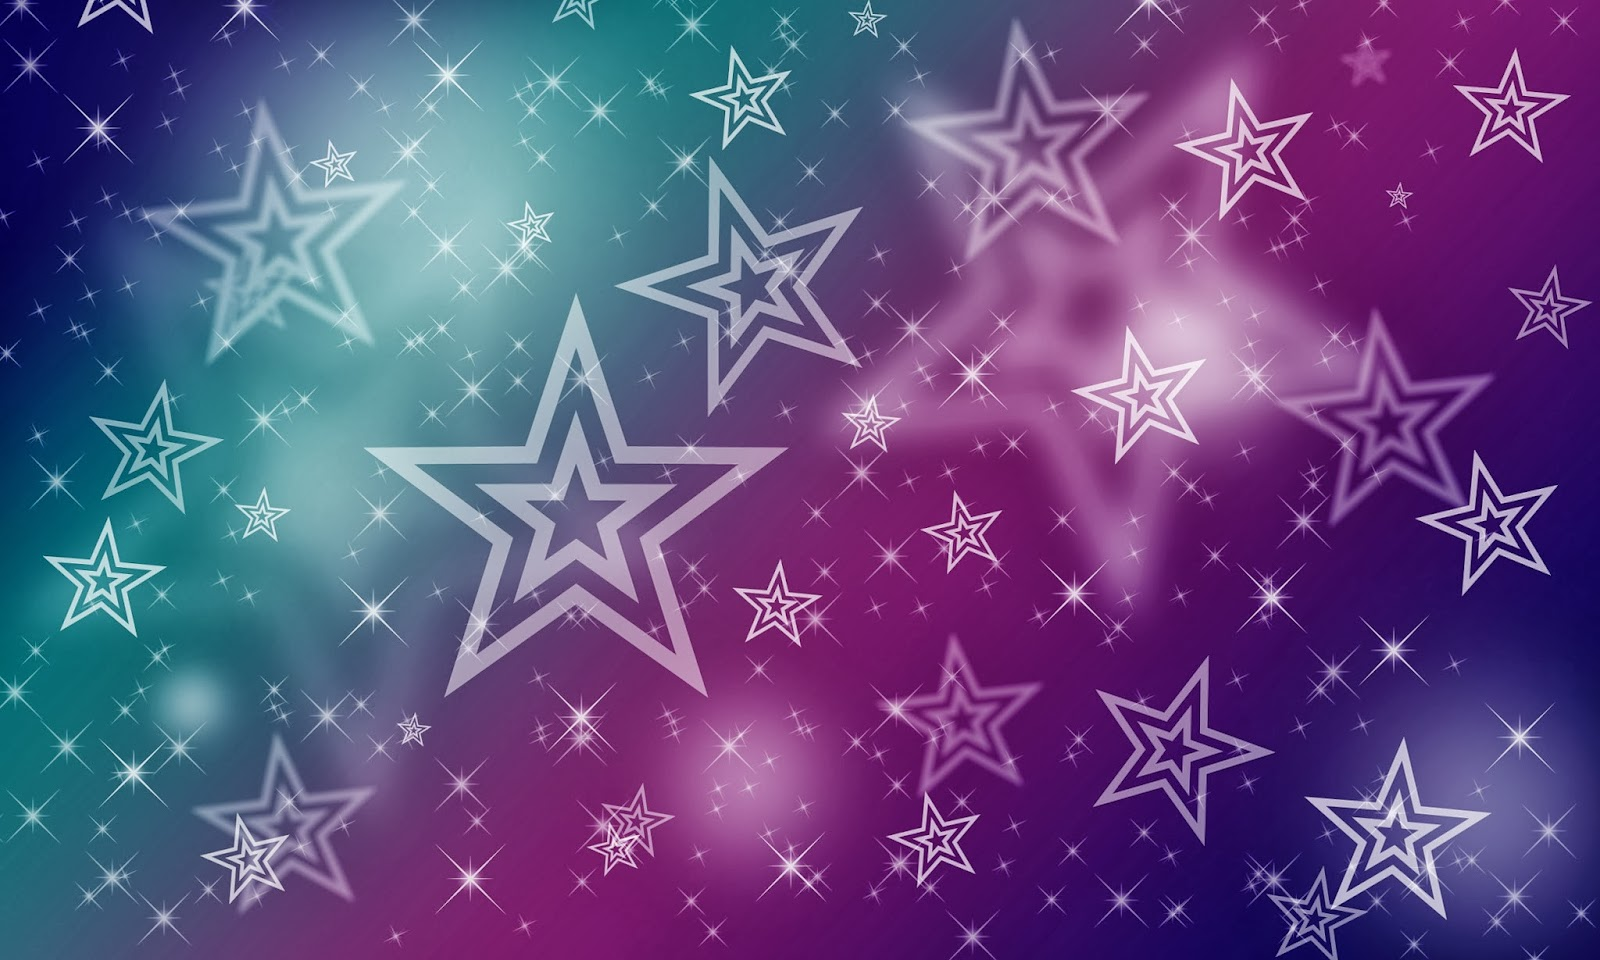 nautical stars abstract wallpaper - photo #42